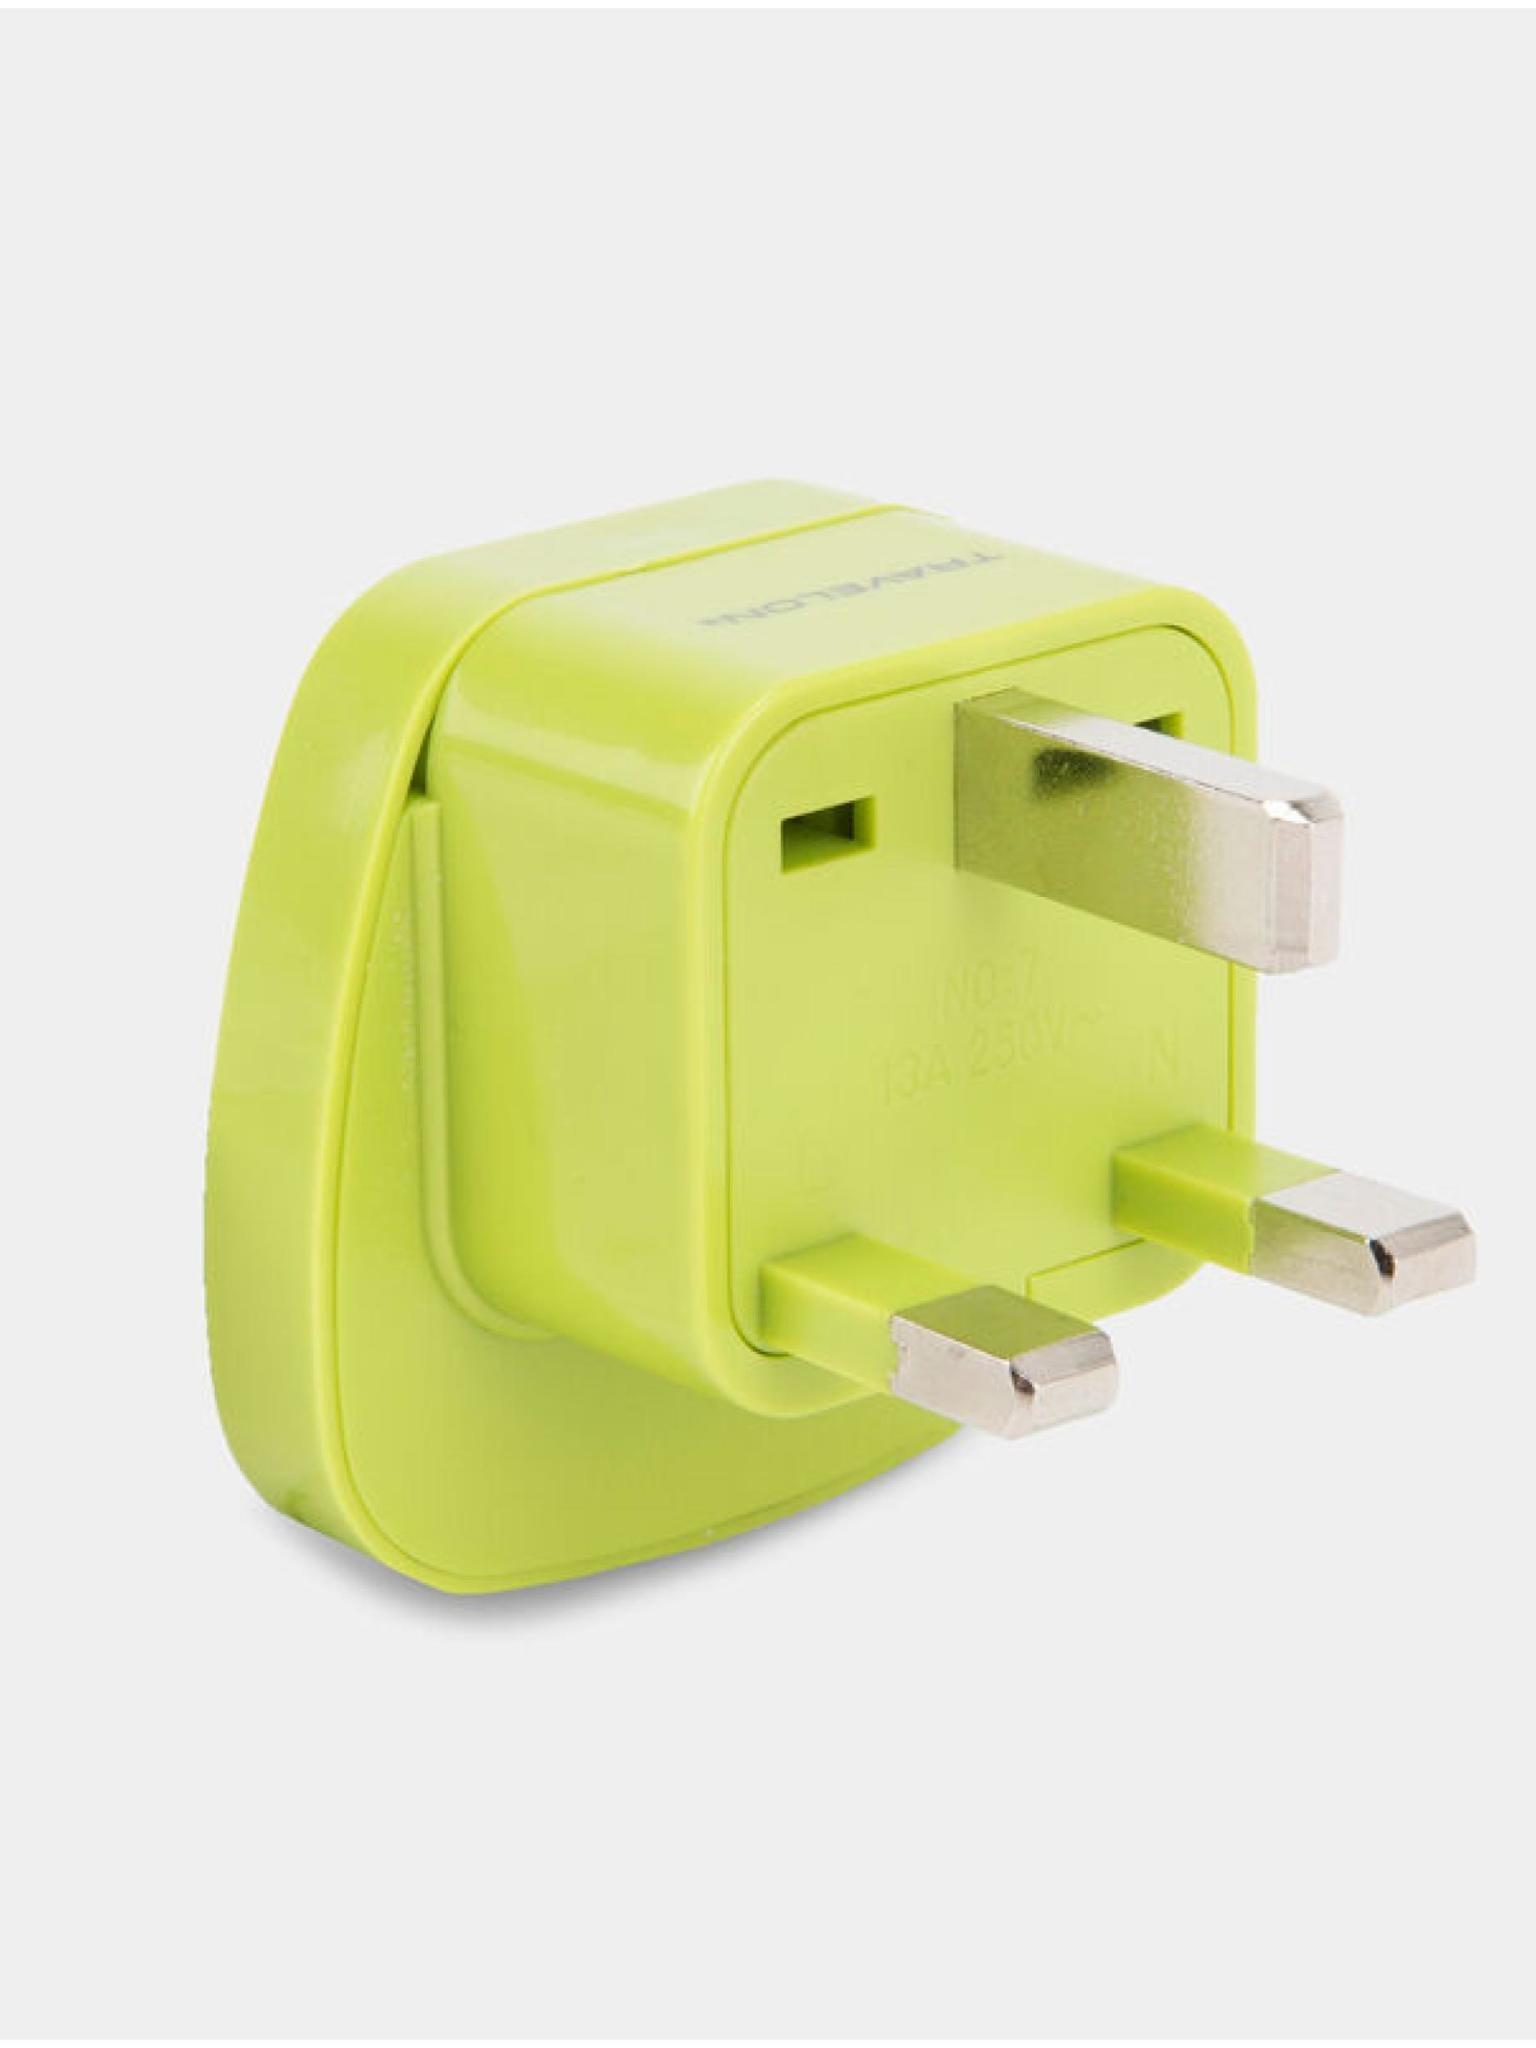 Travelon Grounded Power Adapter:  UK